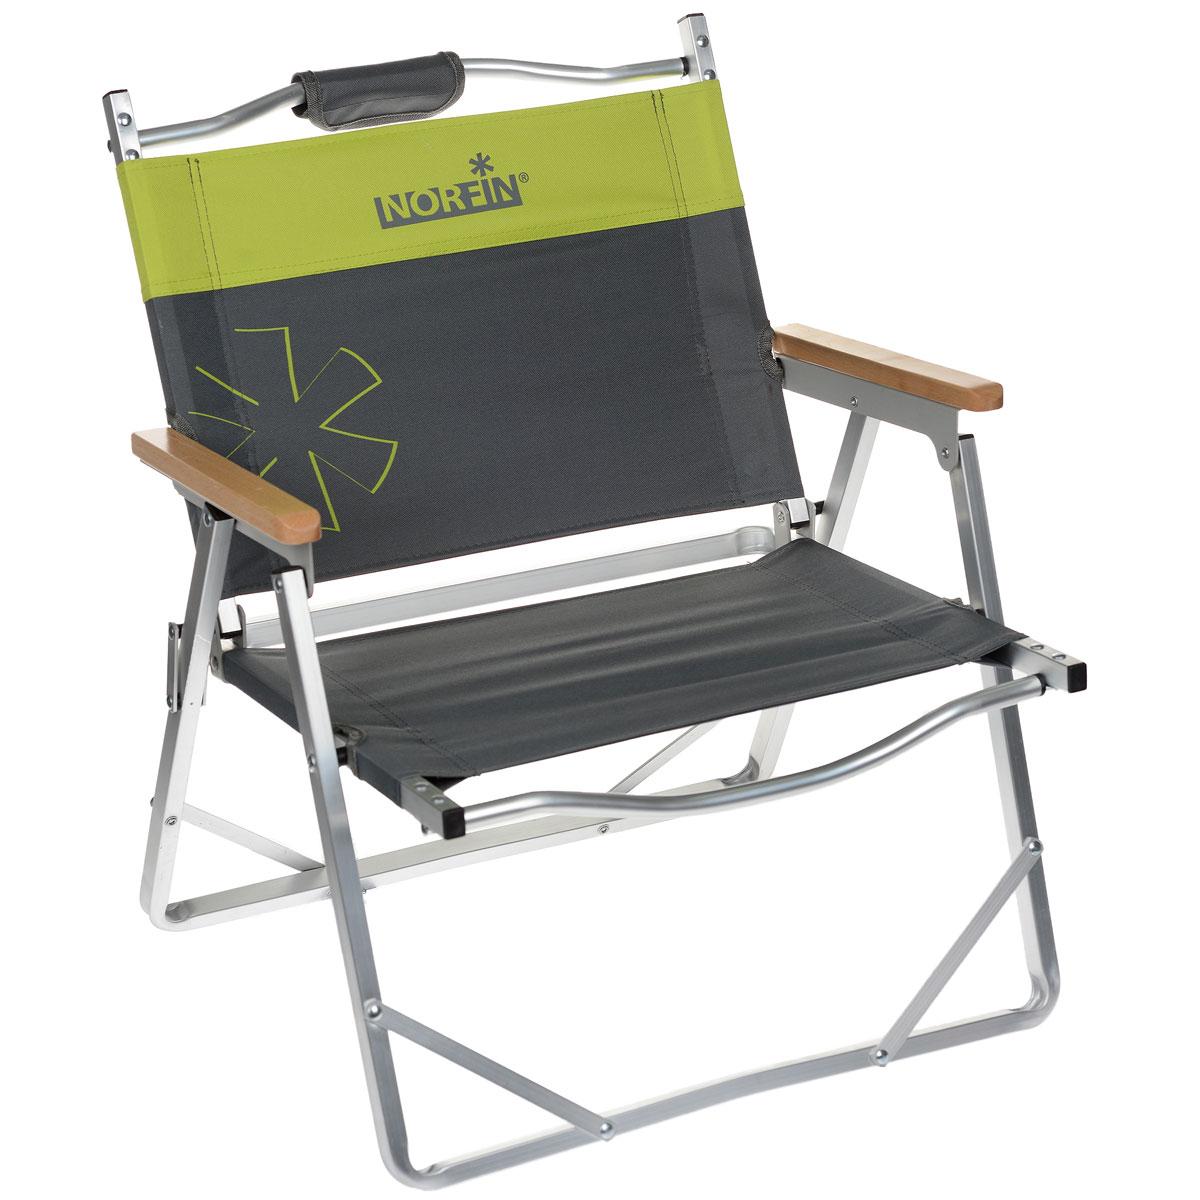 Кресло складное Norfin Alesund NF Alu, цвет: серый, желтый, 47 см х 54 см х 62 см кресло складное happy camper цвет желтый оранжевый